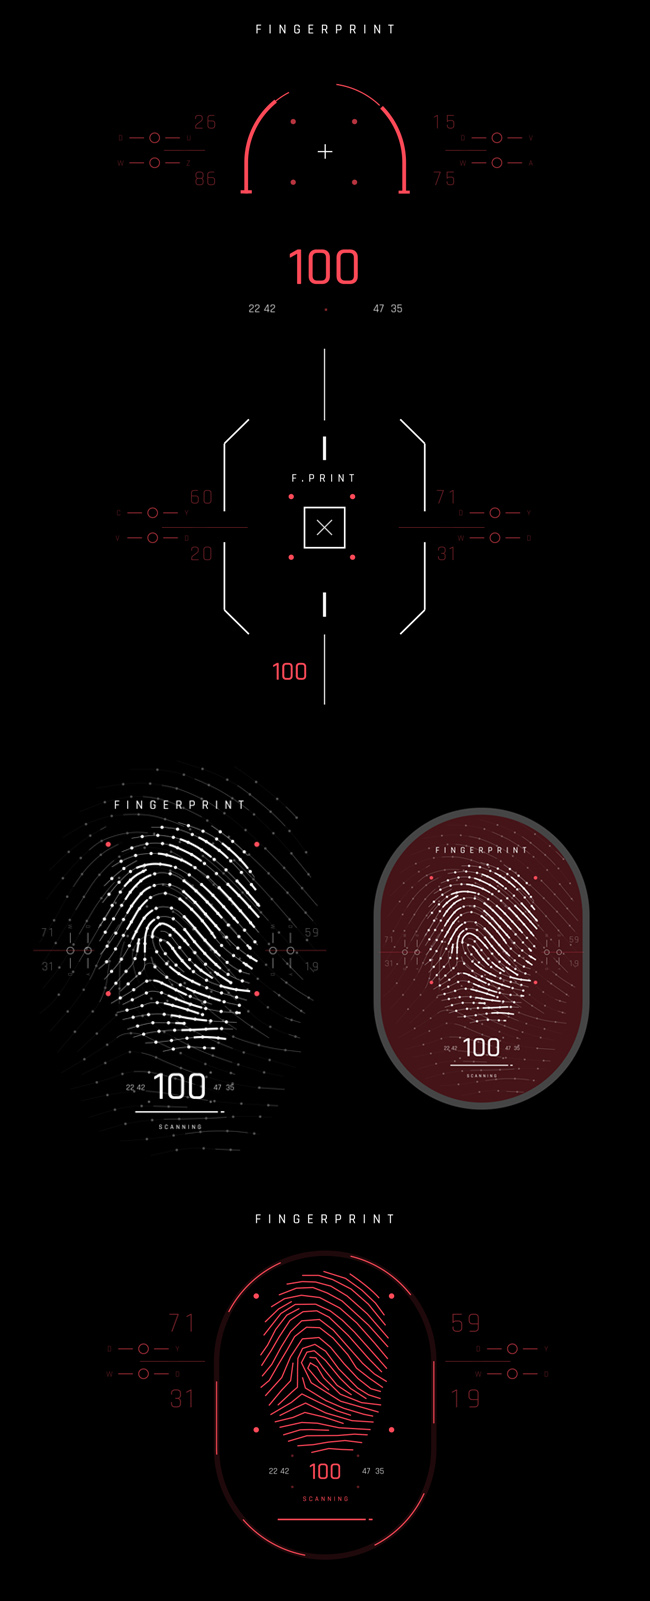 AE脚本-500个HUD高科技赛博朋克UI科幻界面元素动画预设包 Cyberpunk HUD UI 500+ 已修复中文版AE表达式报错插图44